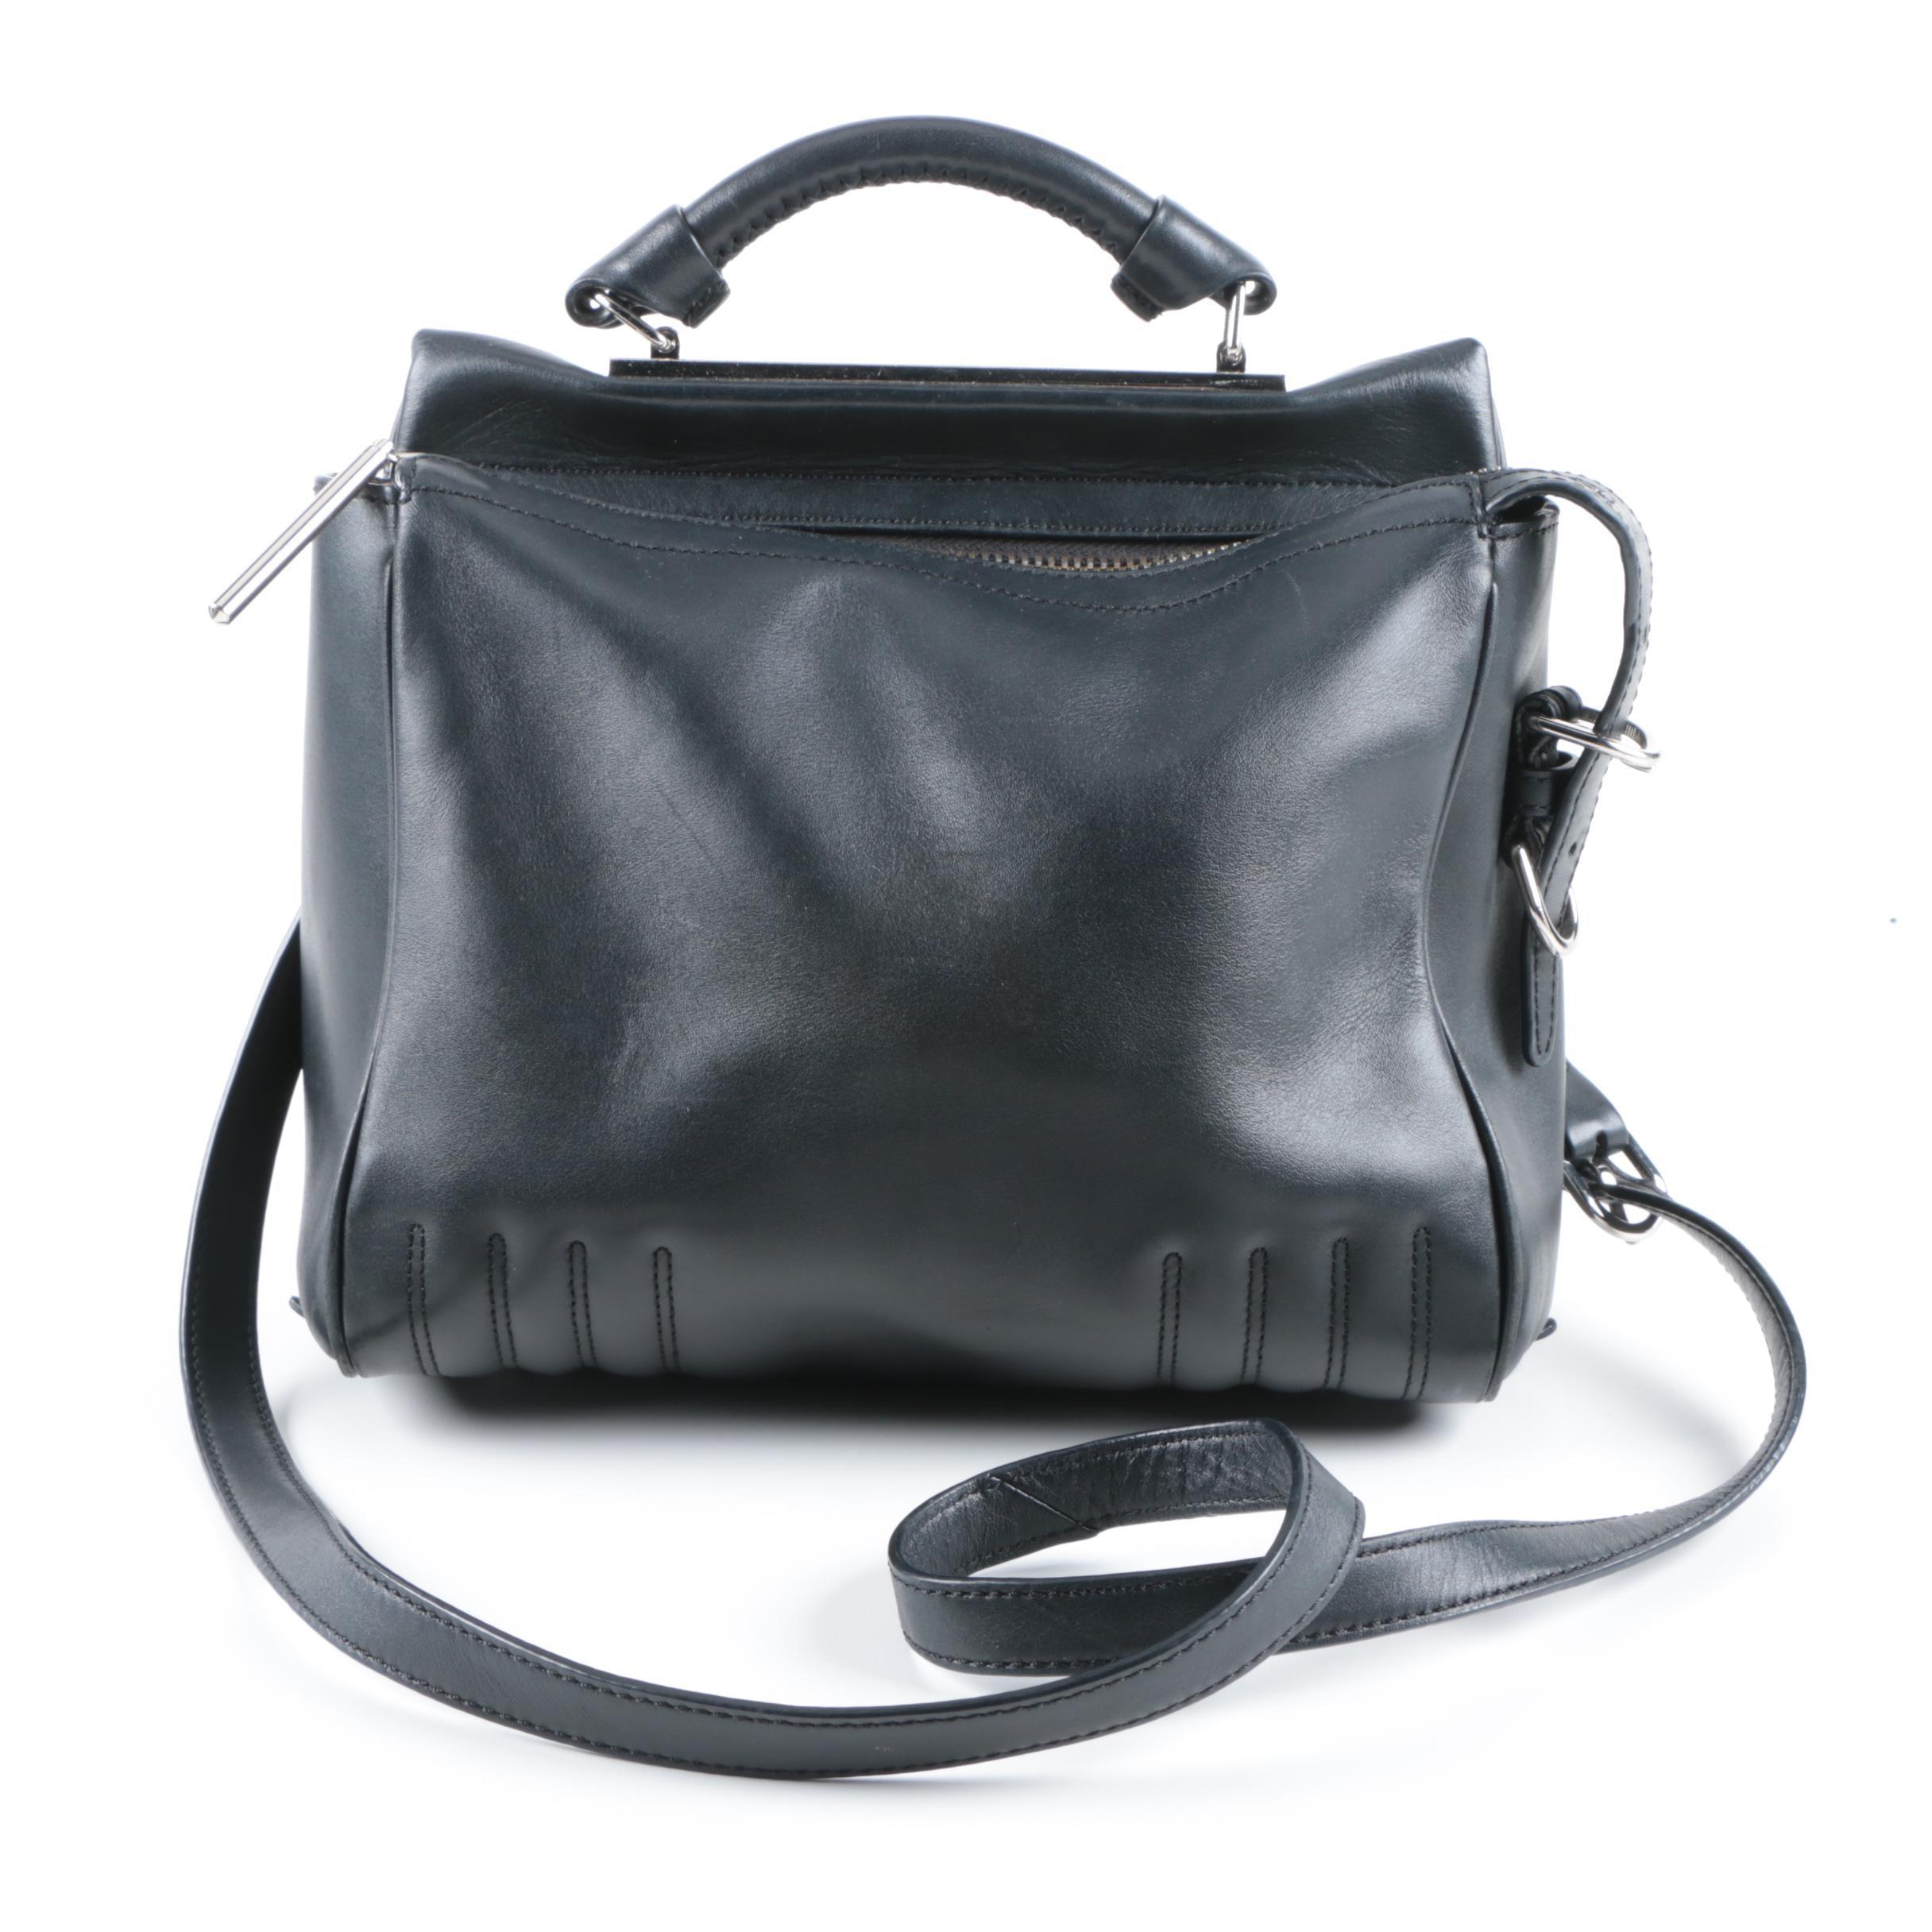 3.1 Phillip Lim Leather Ryder Satchel Handbag